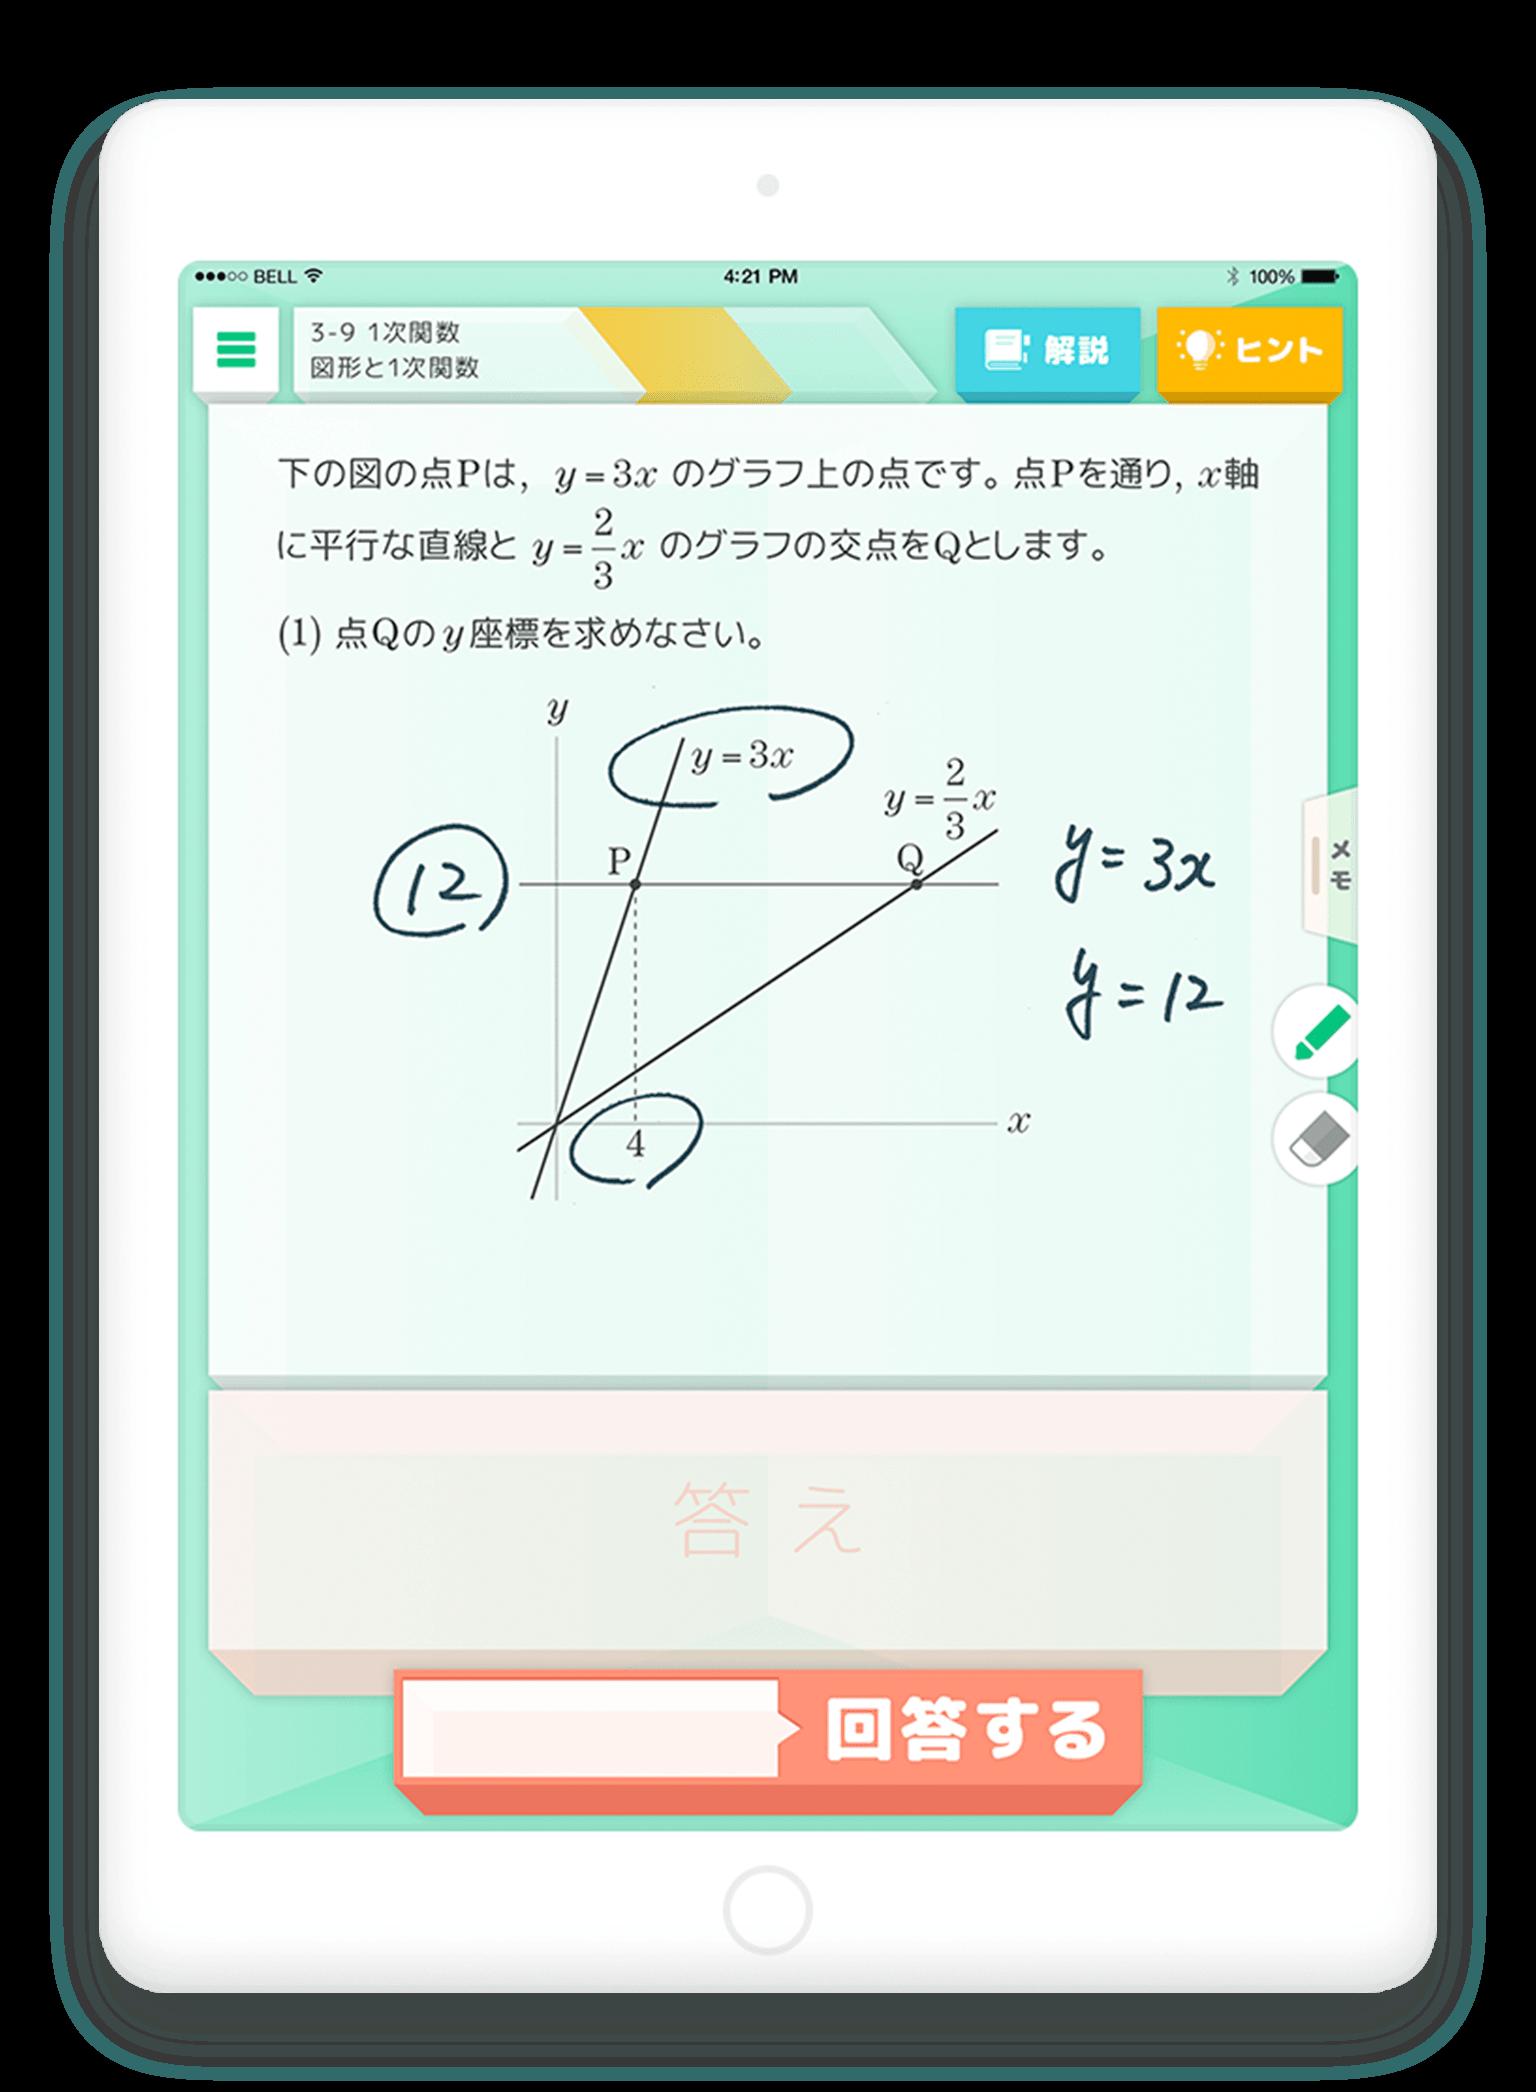 D24557-43-592252-0